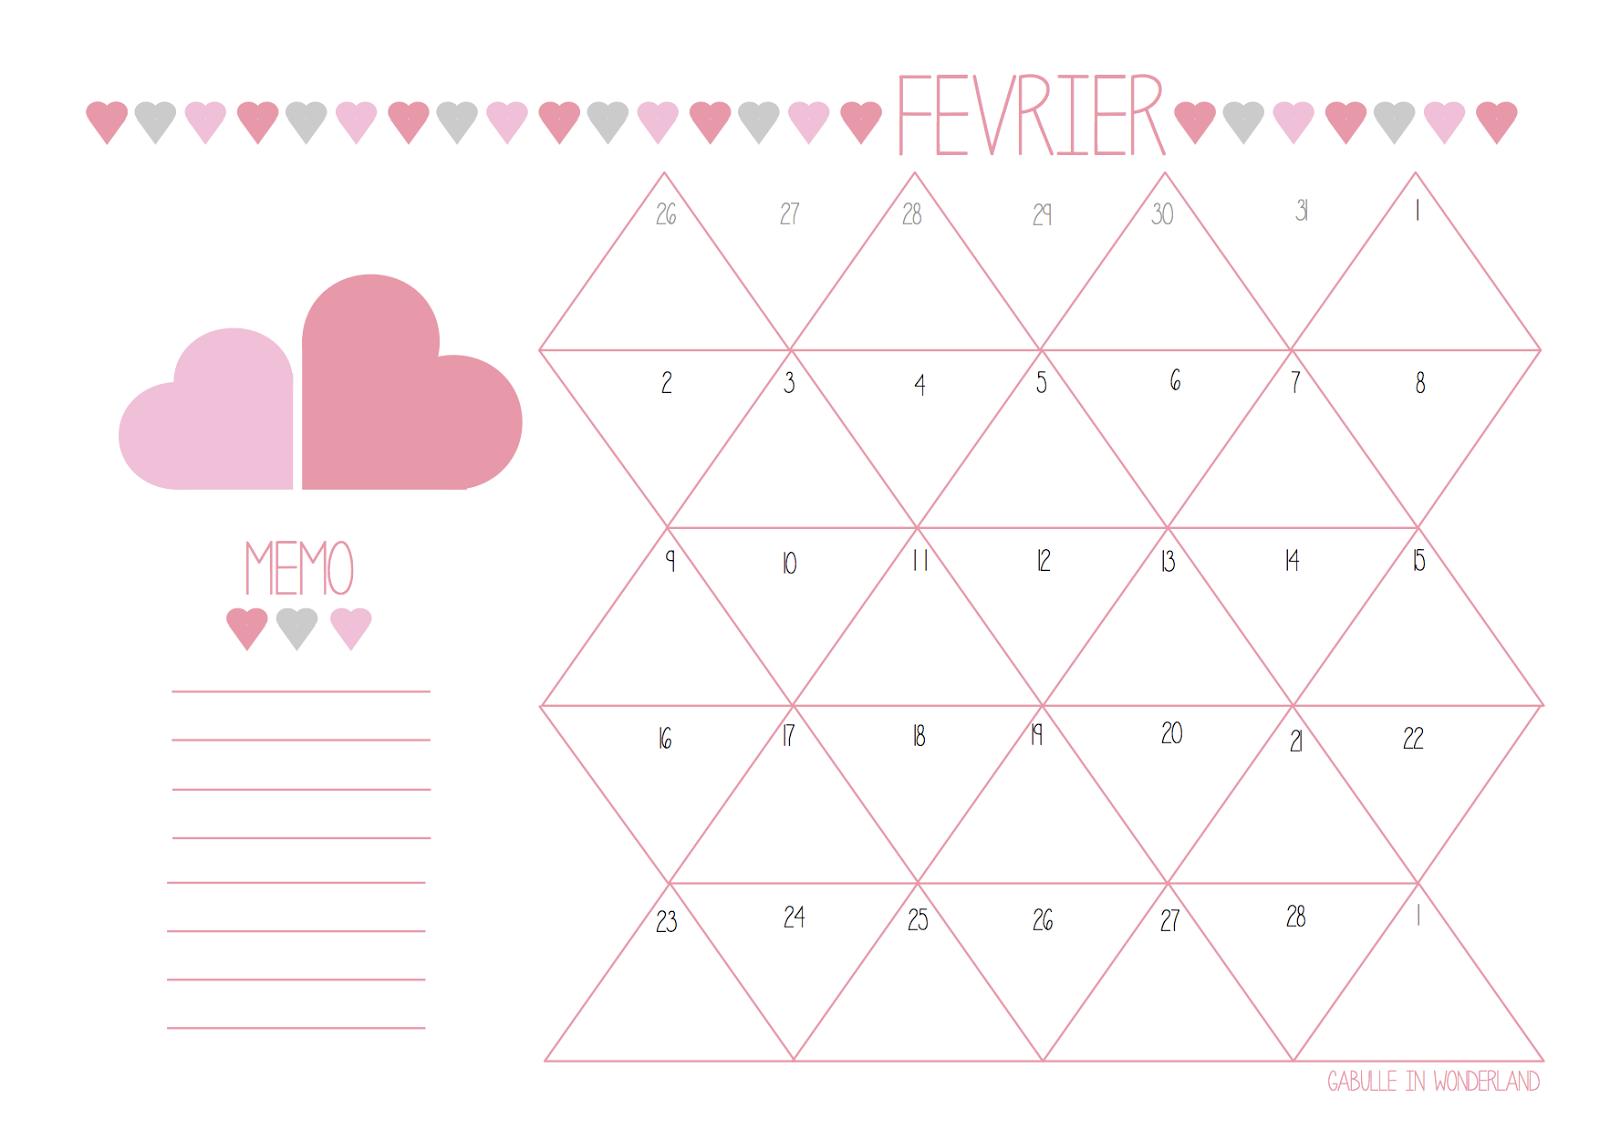 Calendriers mensuels f vrier 2015 imprimer gratuit for Calendrier jardin fevrier 2015